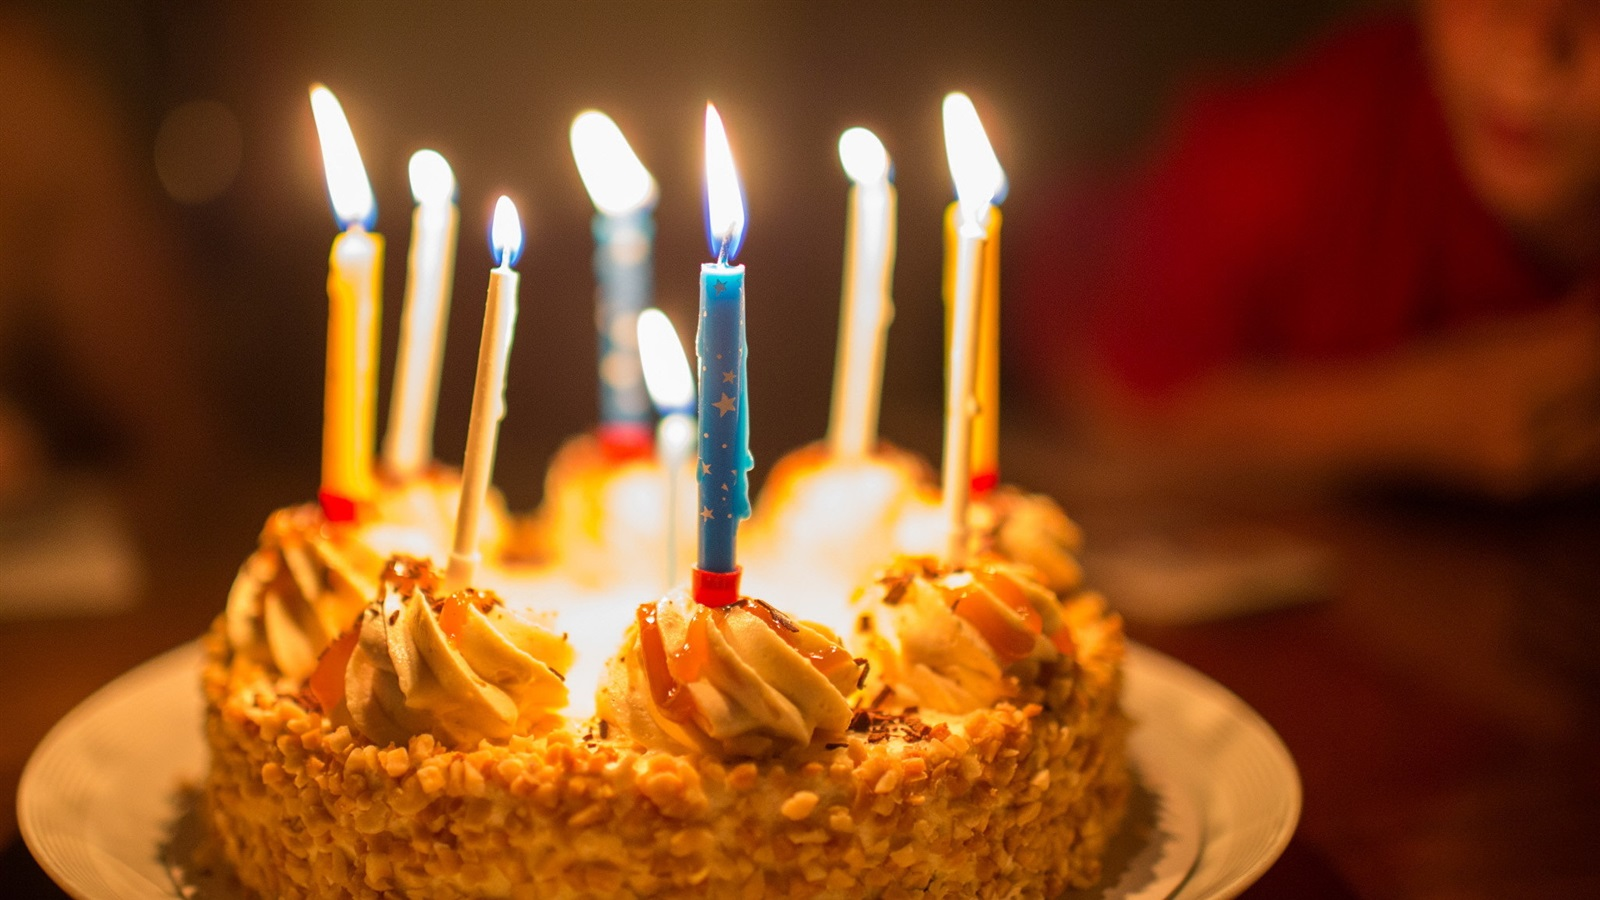 торт на день рожденье картинки вот